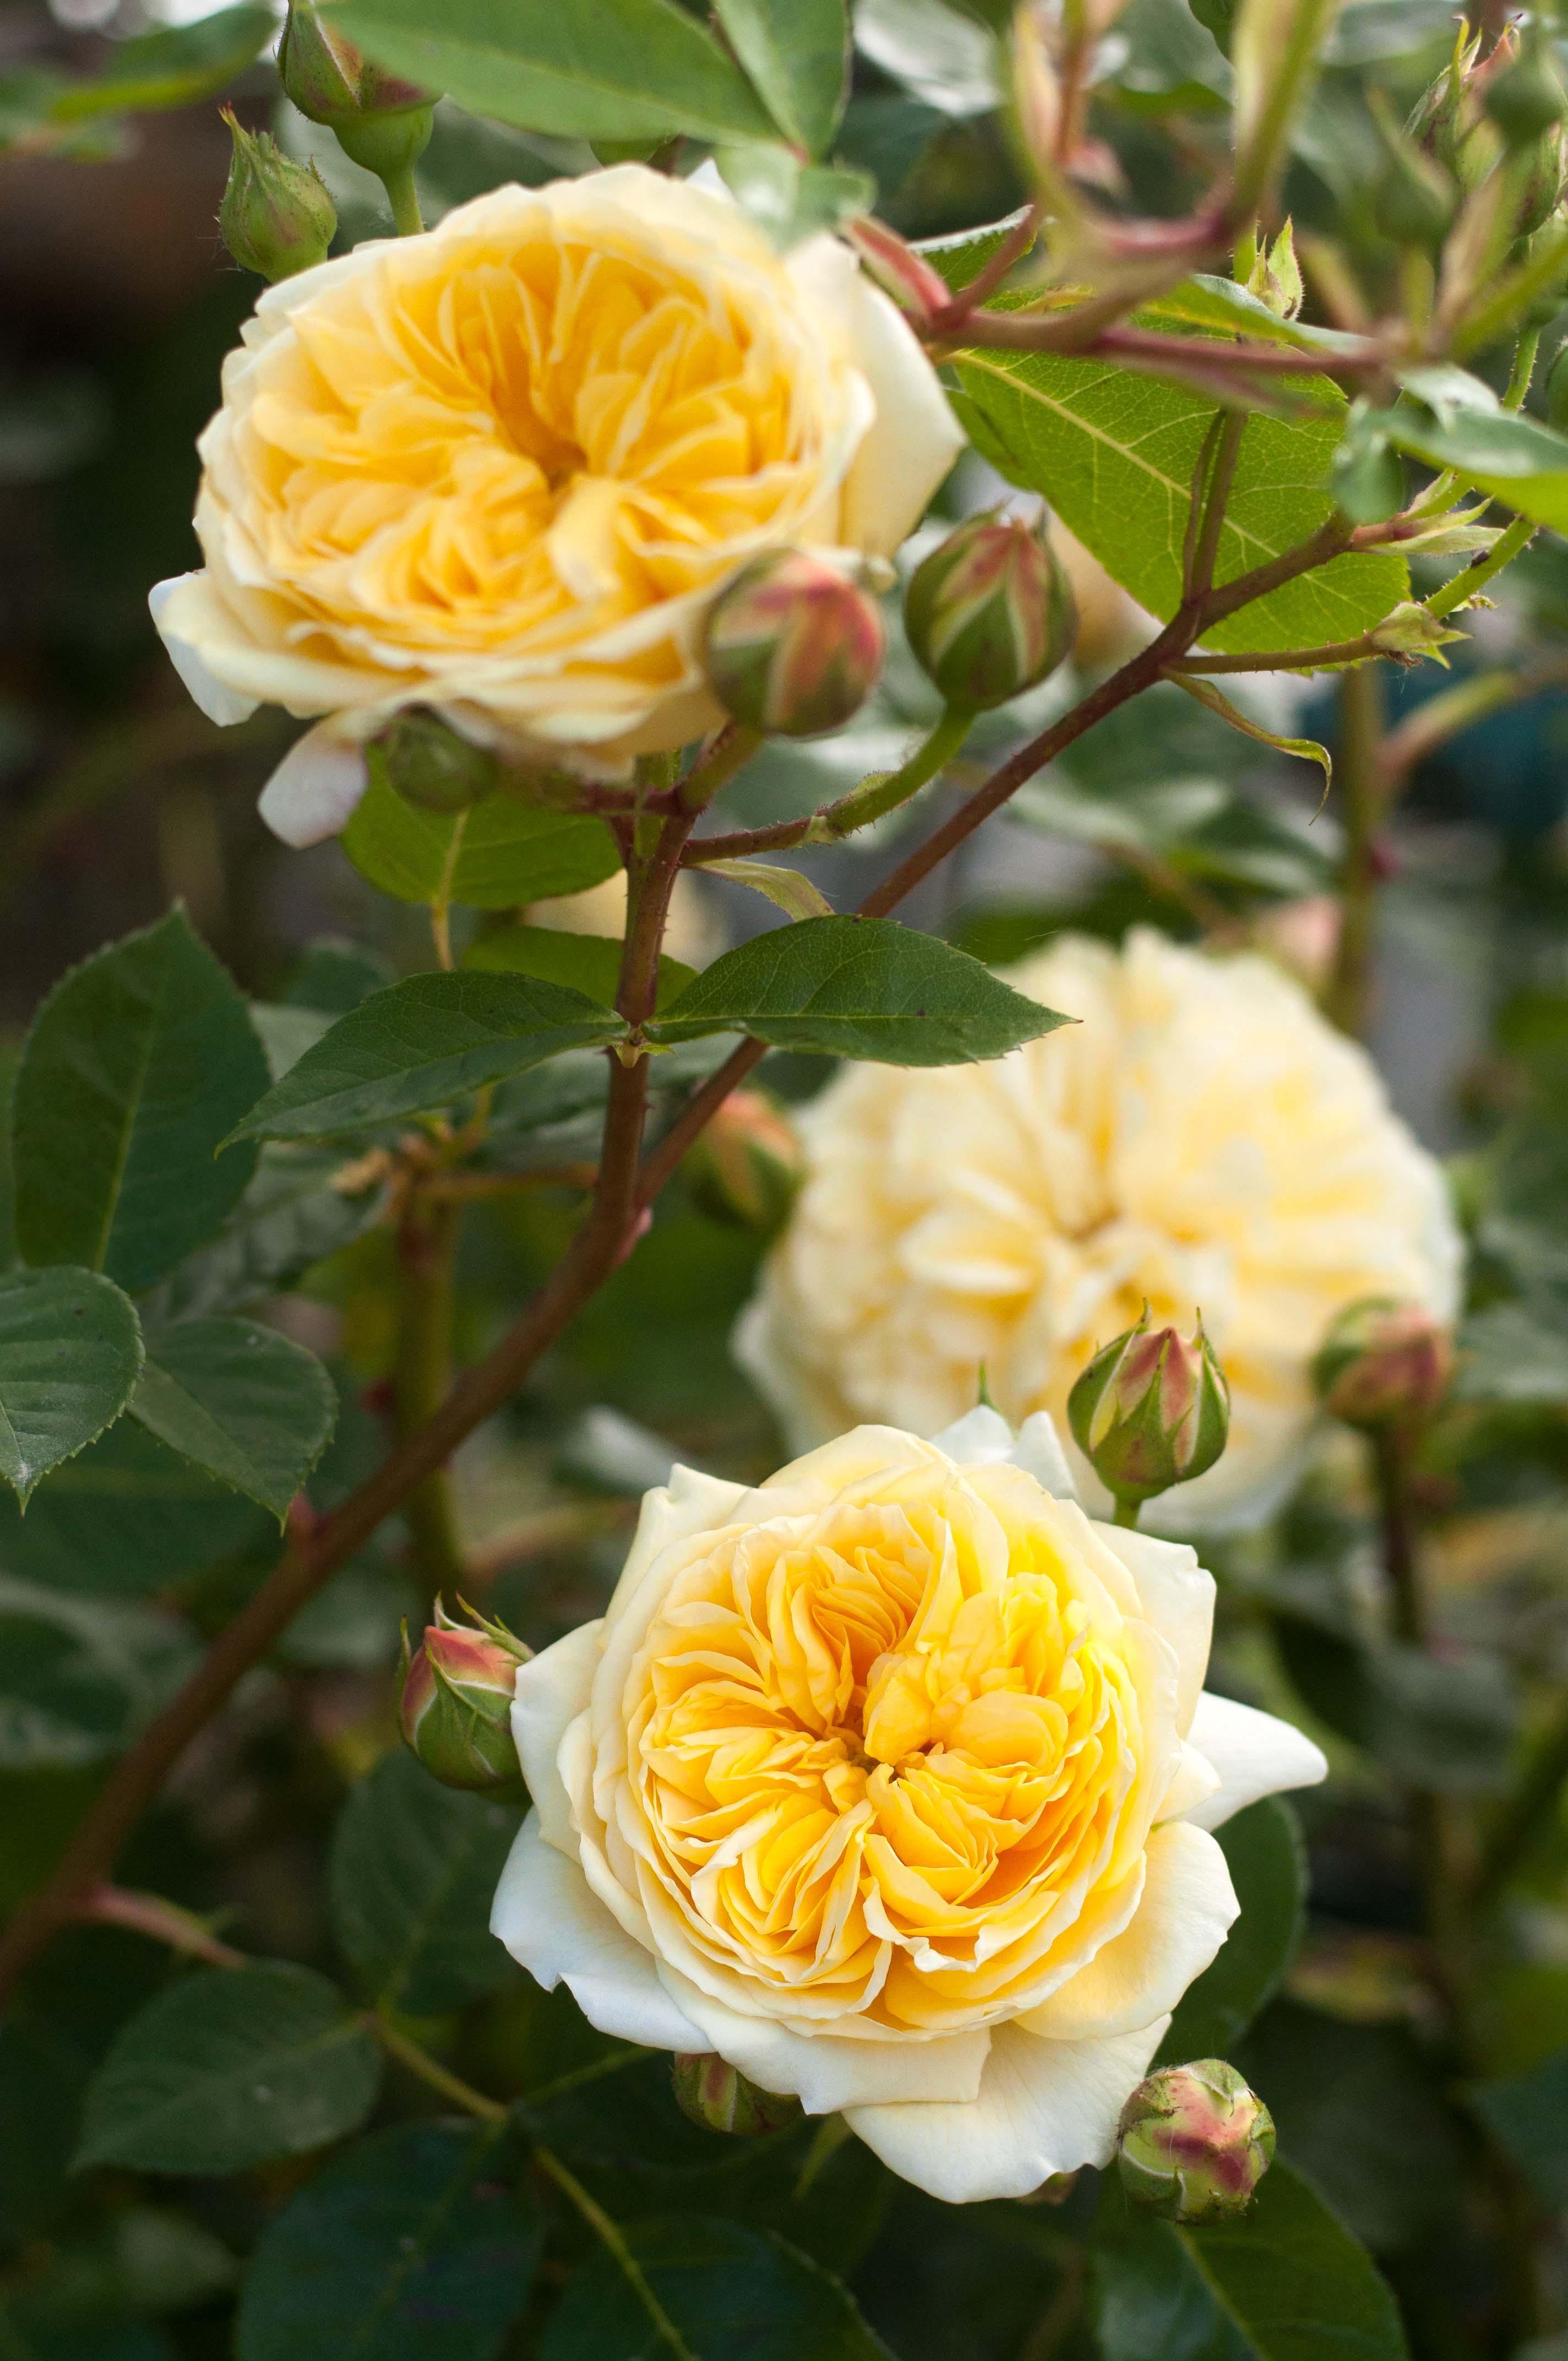 rose-teasing-georgia2-2